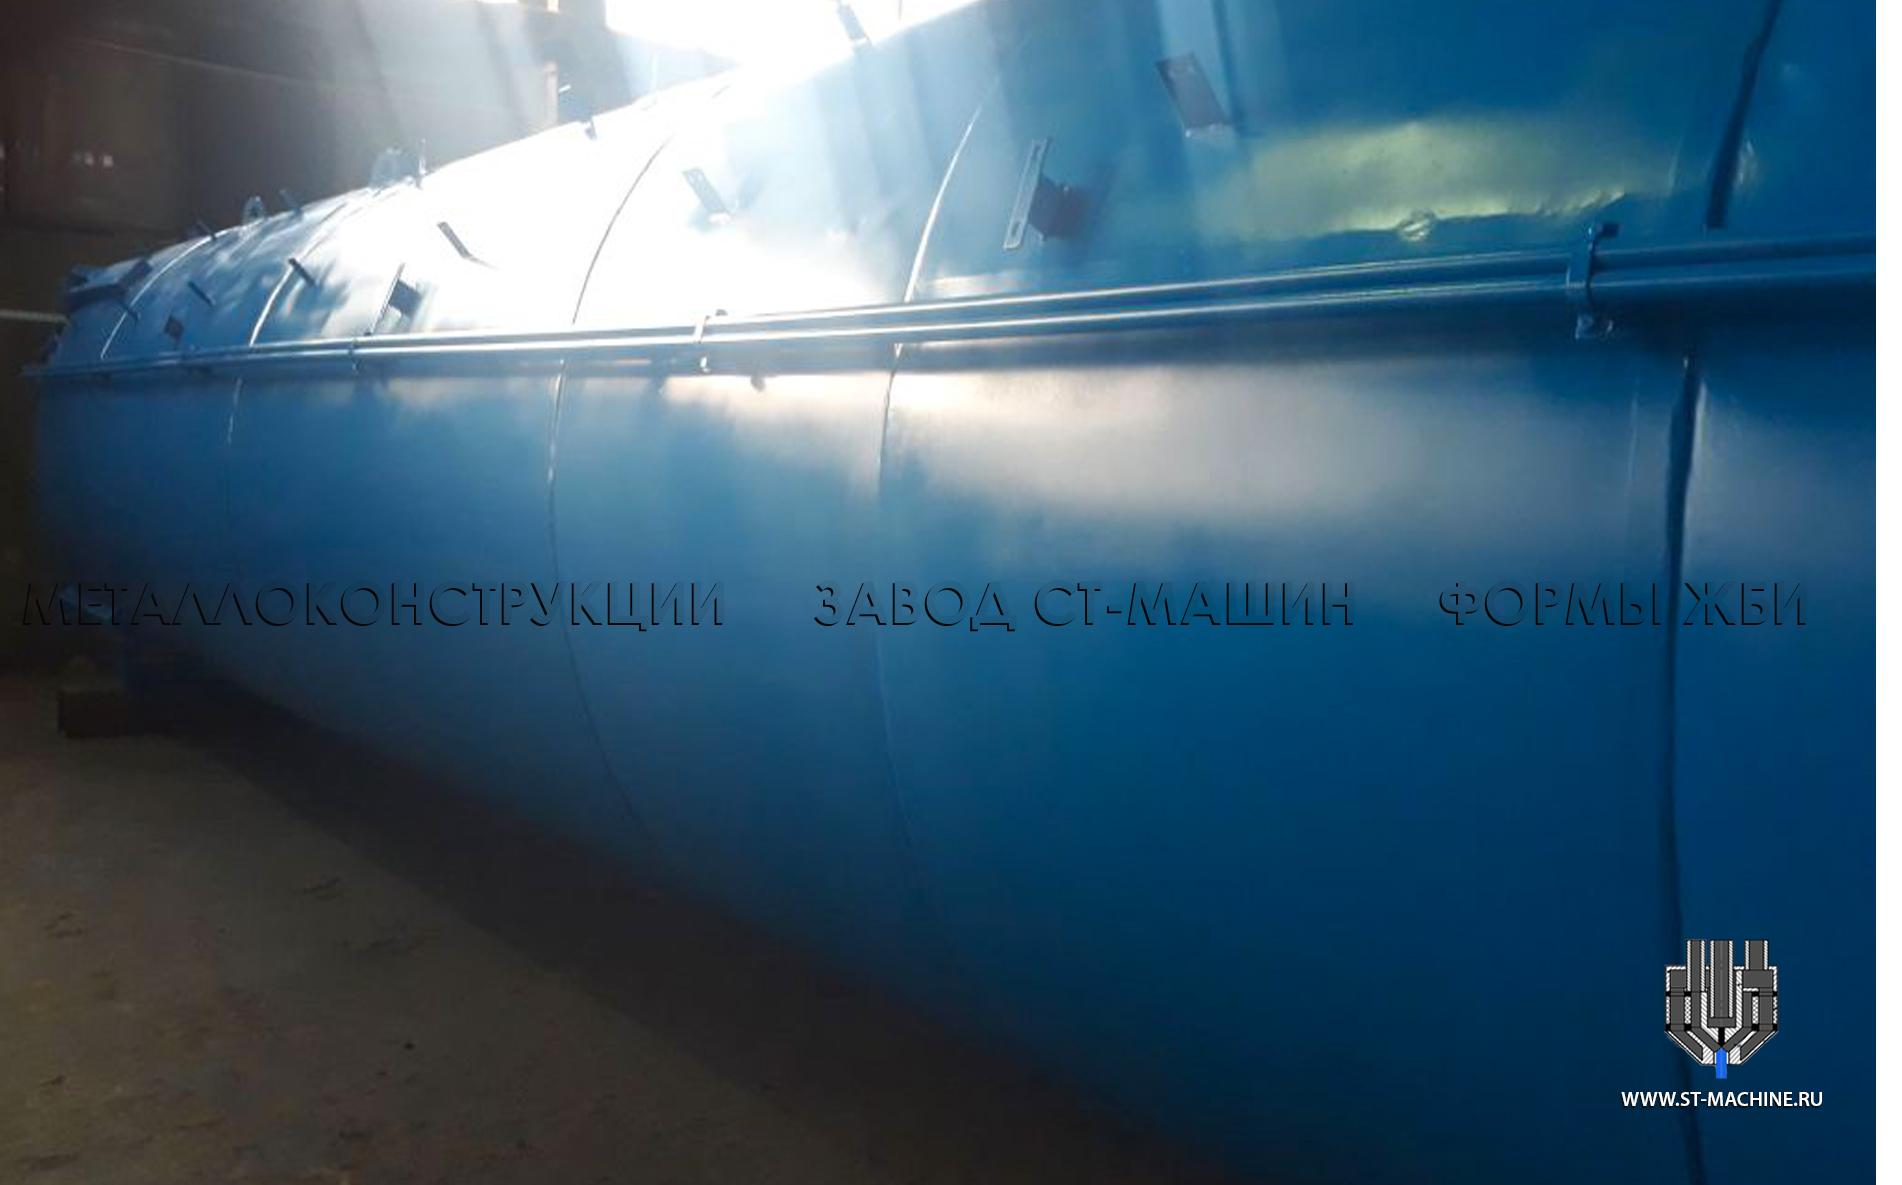 st-machine-ru-silos-zakazat.jpg